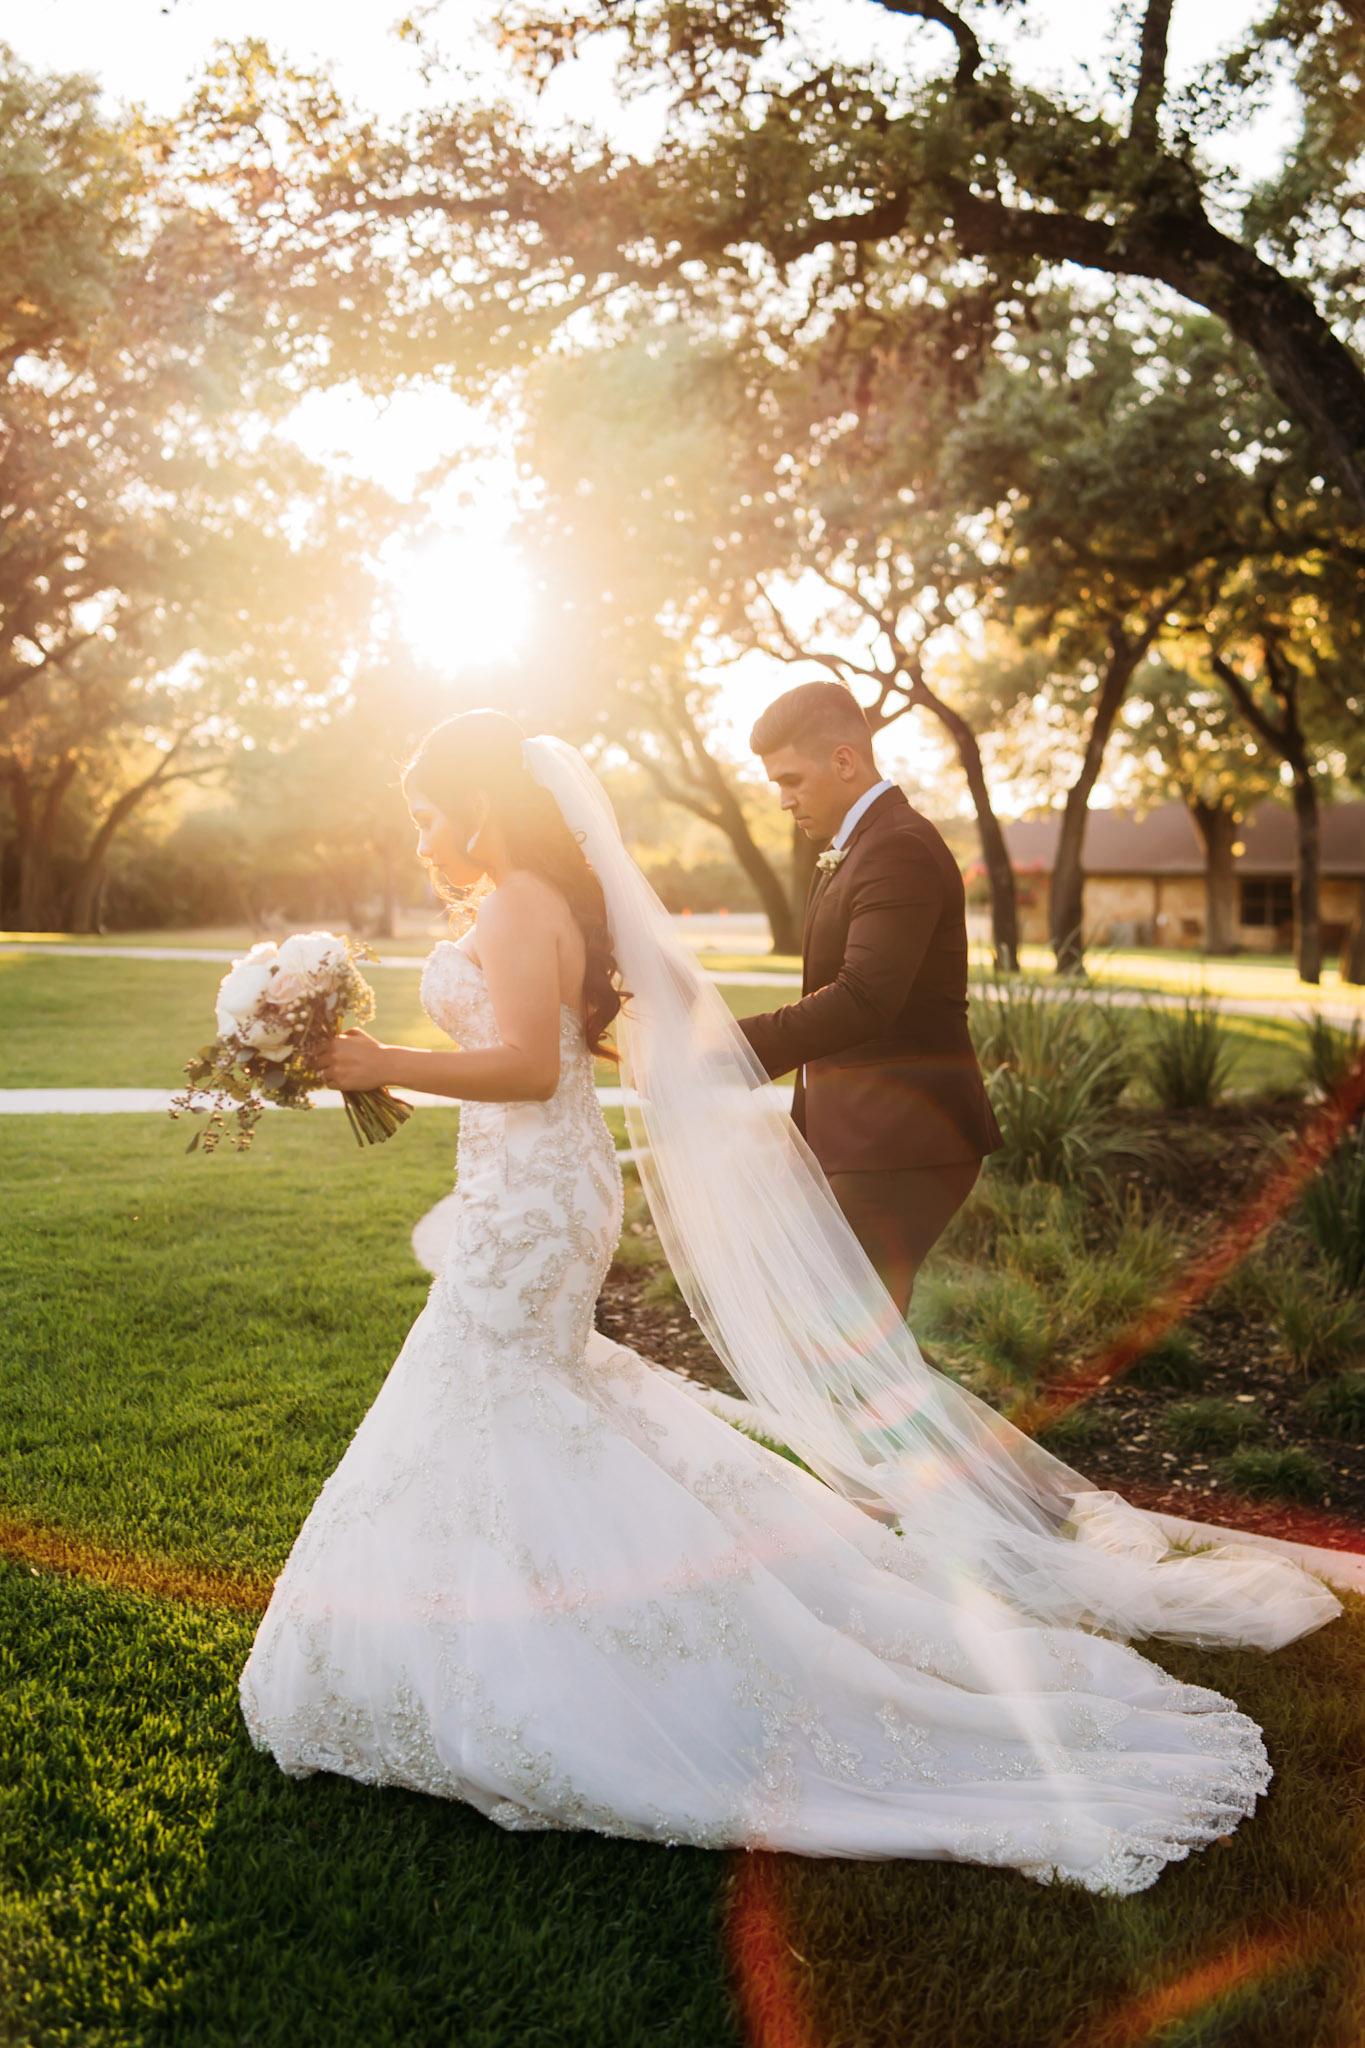 060718-A-JoeDel-Wedding-AdrianRGarcia-FOMAScine_AA98613.jpg